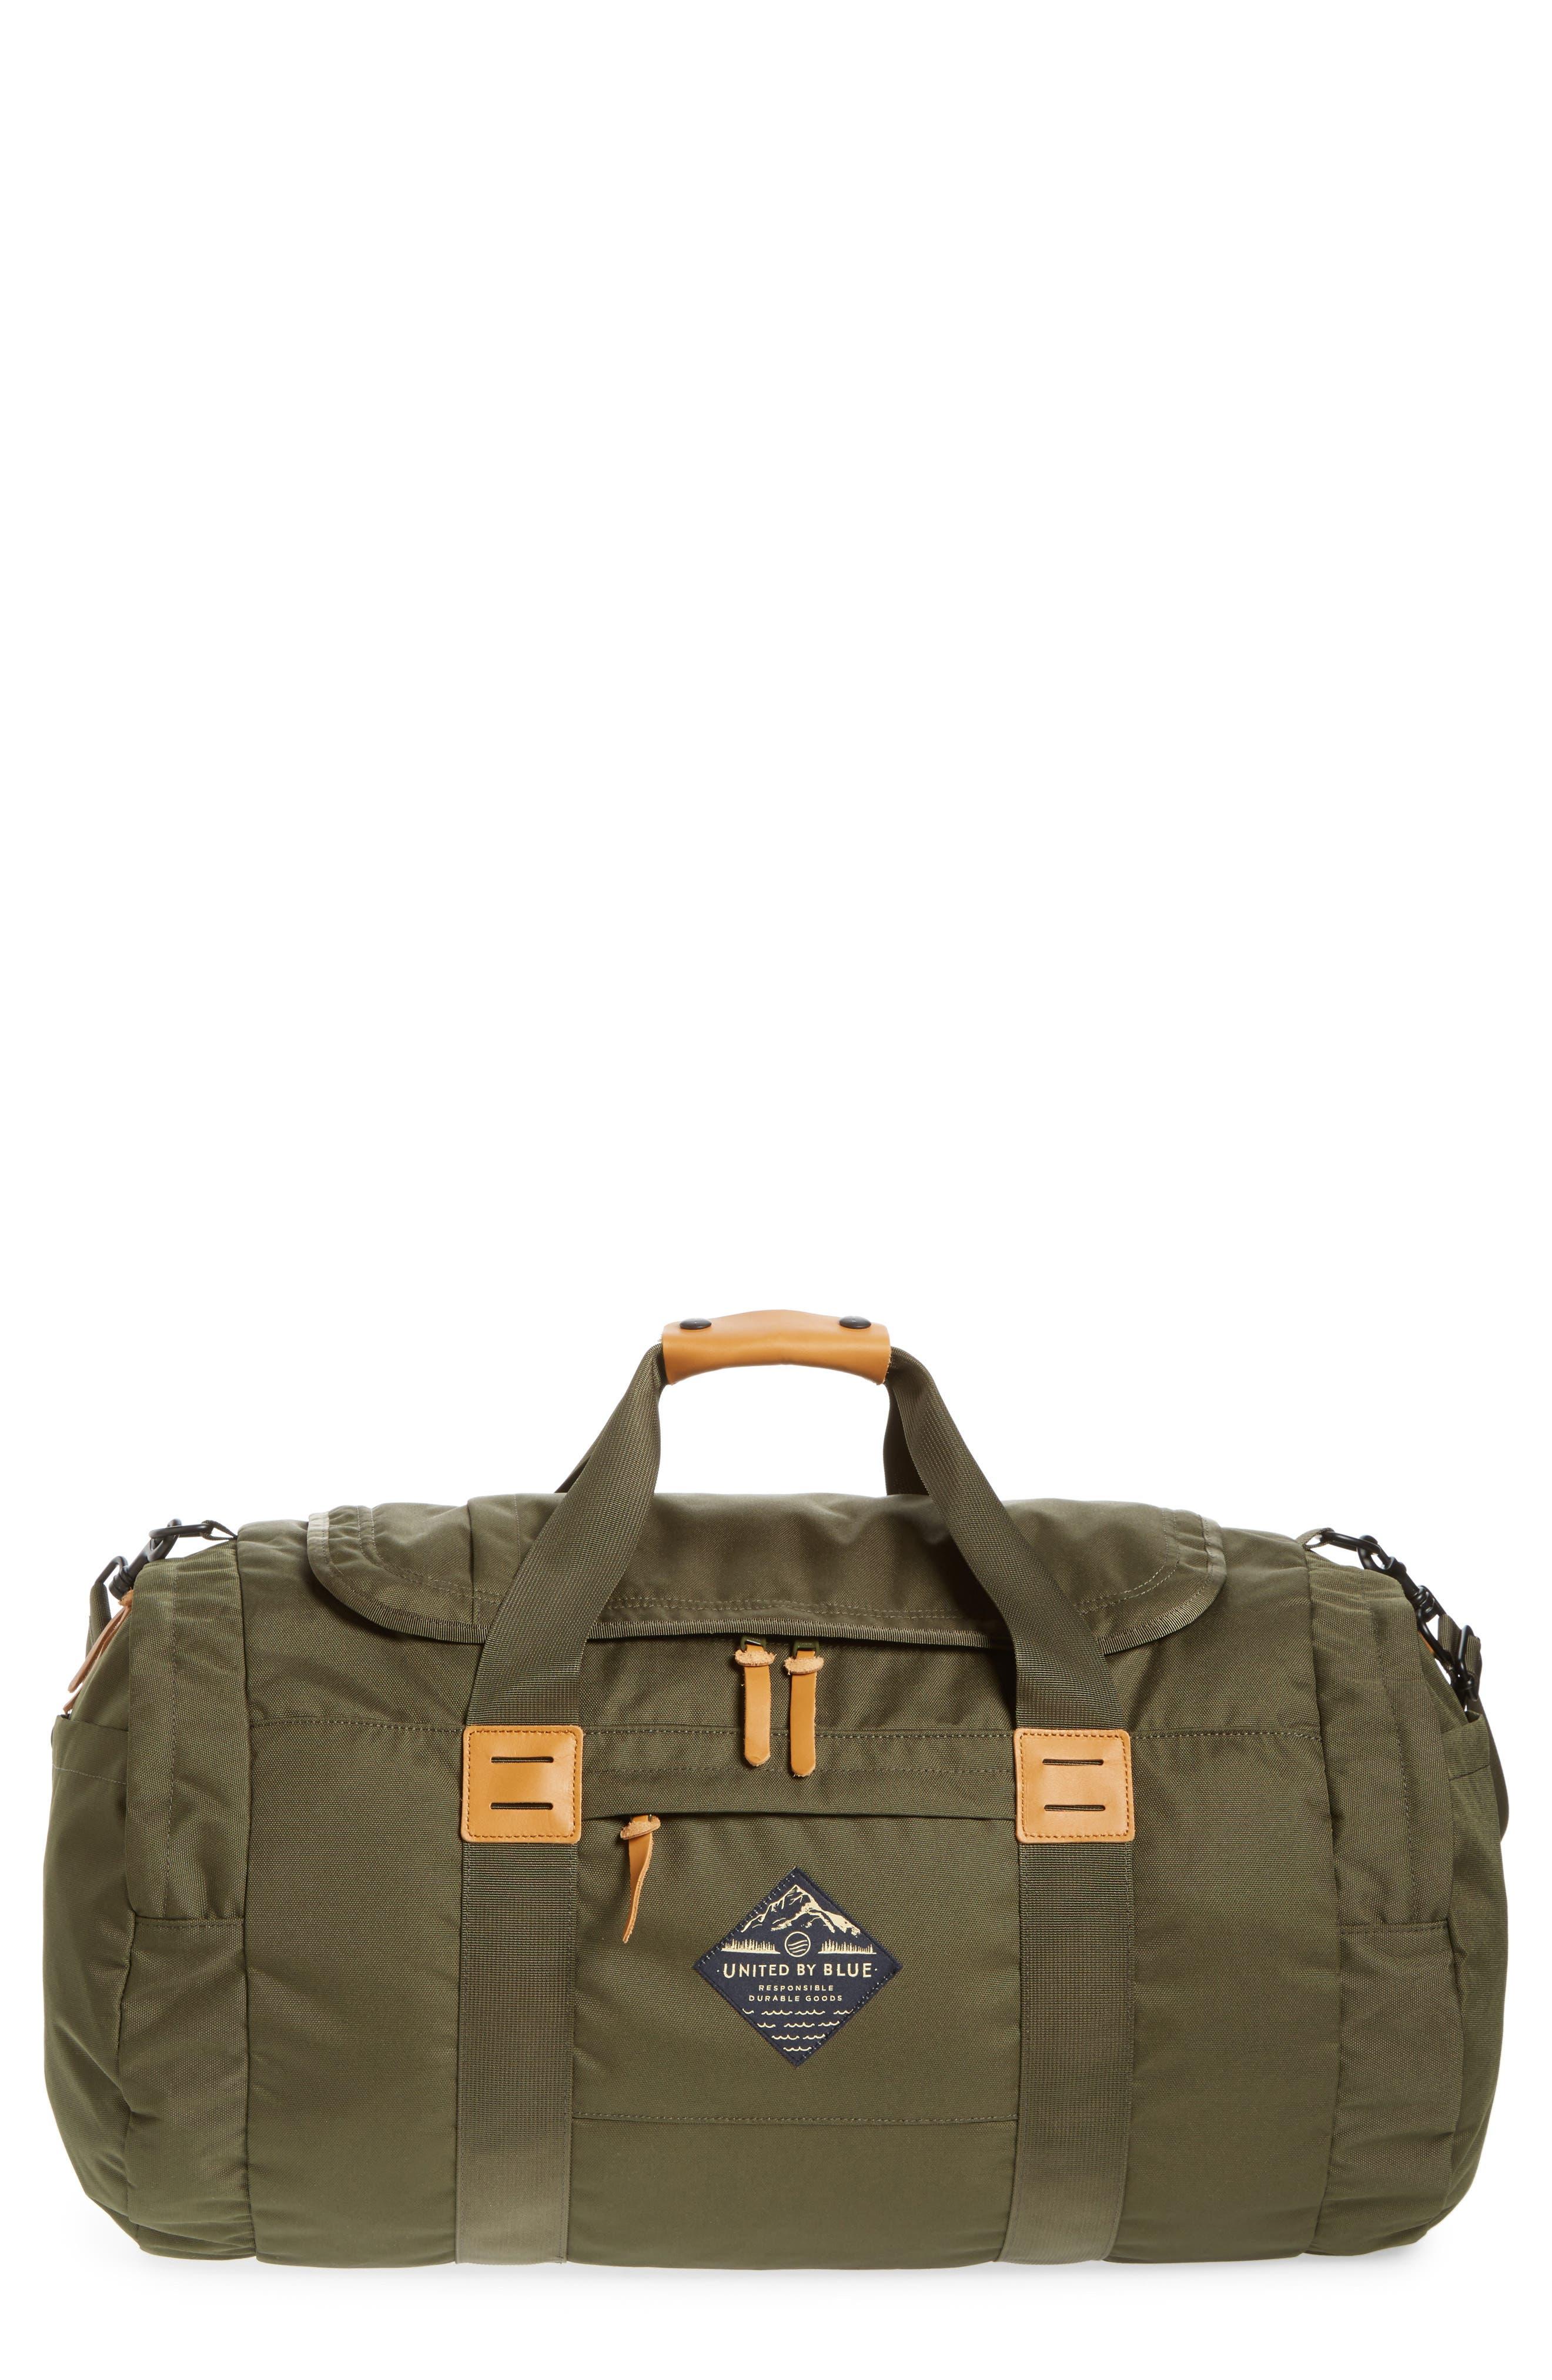 Arc Duffel Bag,                             Main thumbnail 1, color,                             Olive